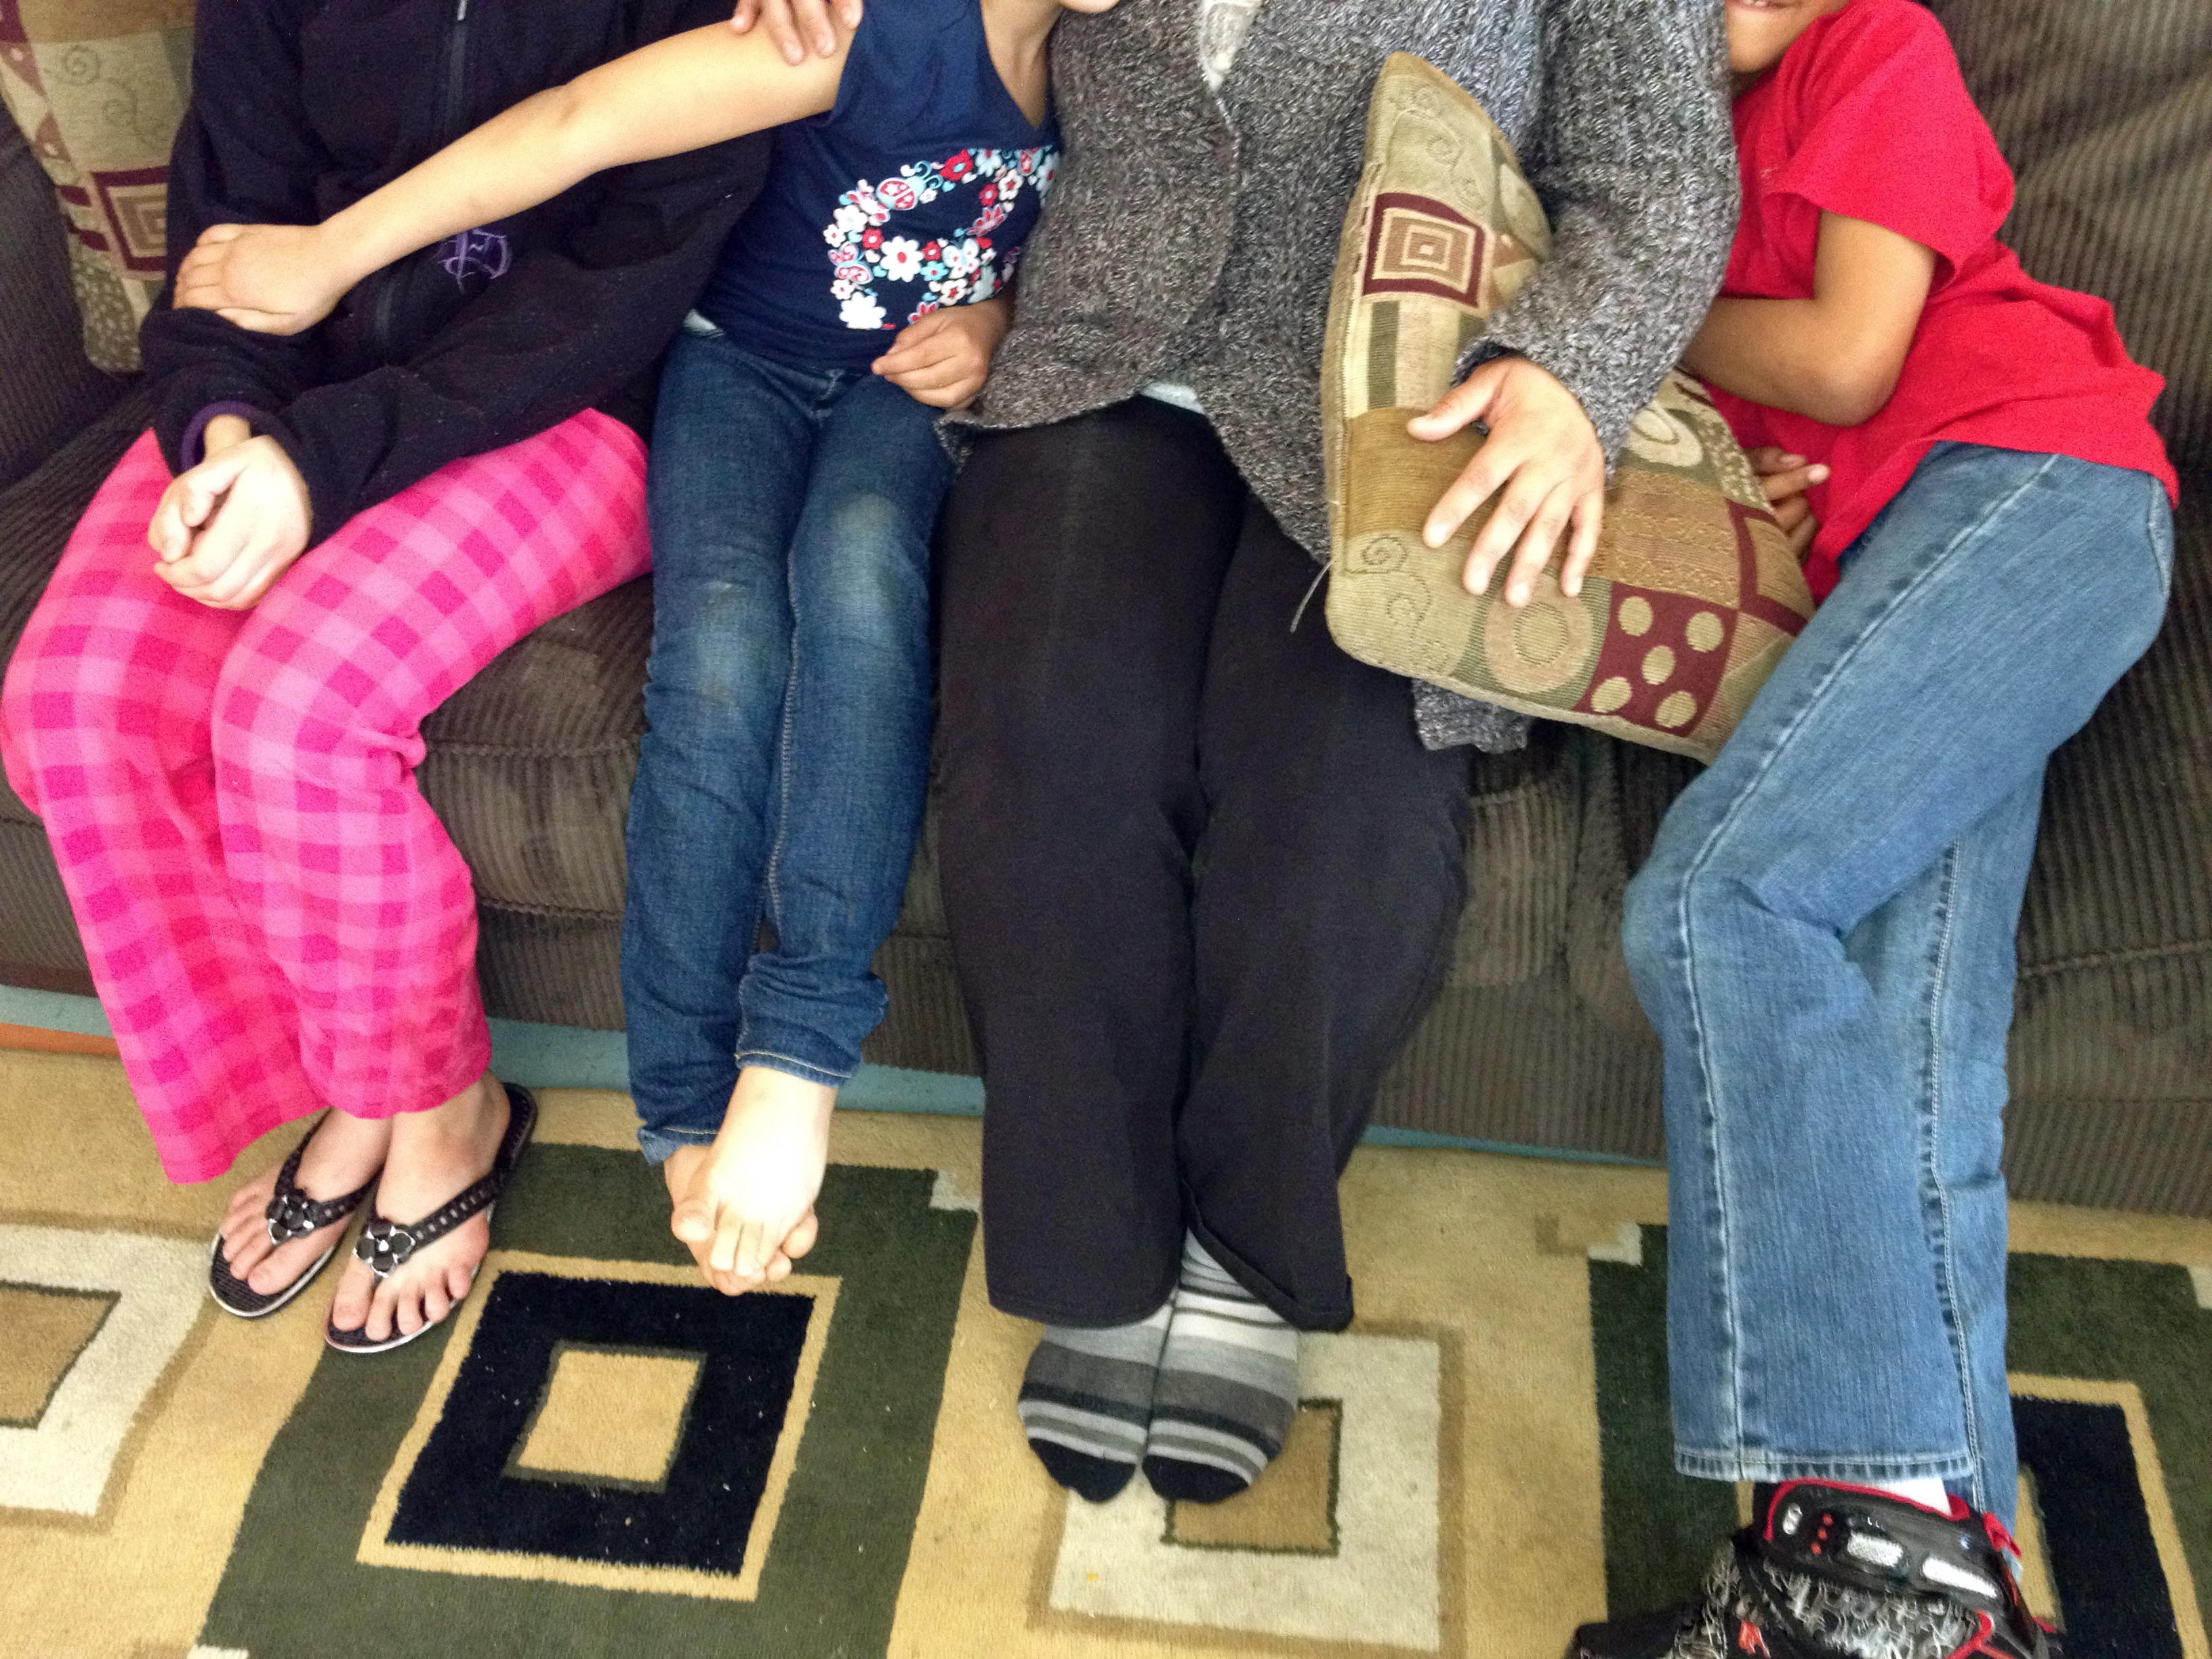 Caption: Wanda and her family, Credit: Joanna Solotaroff